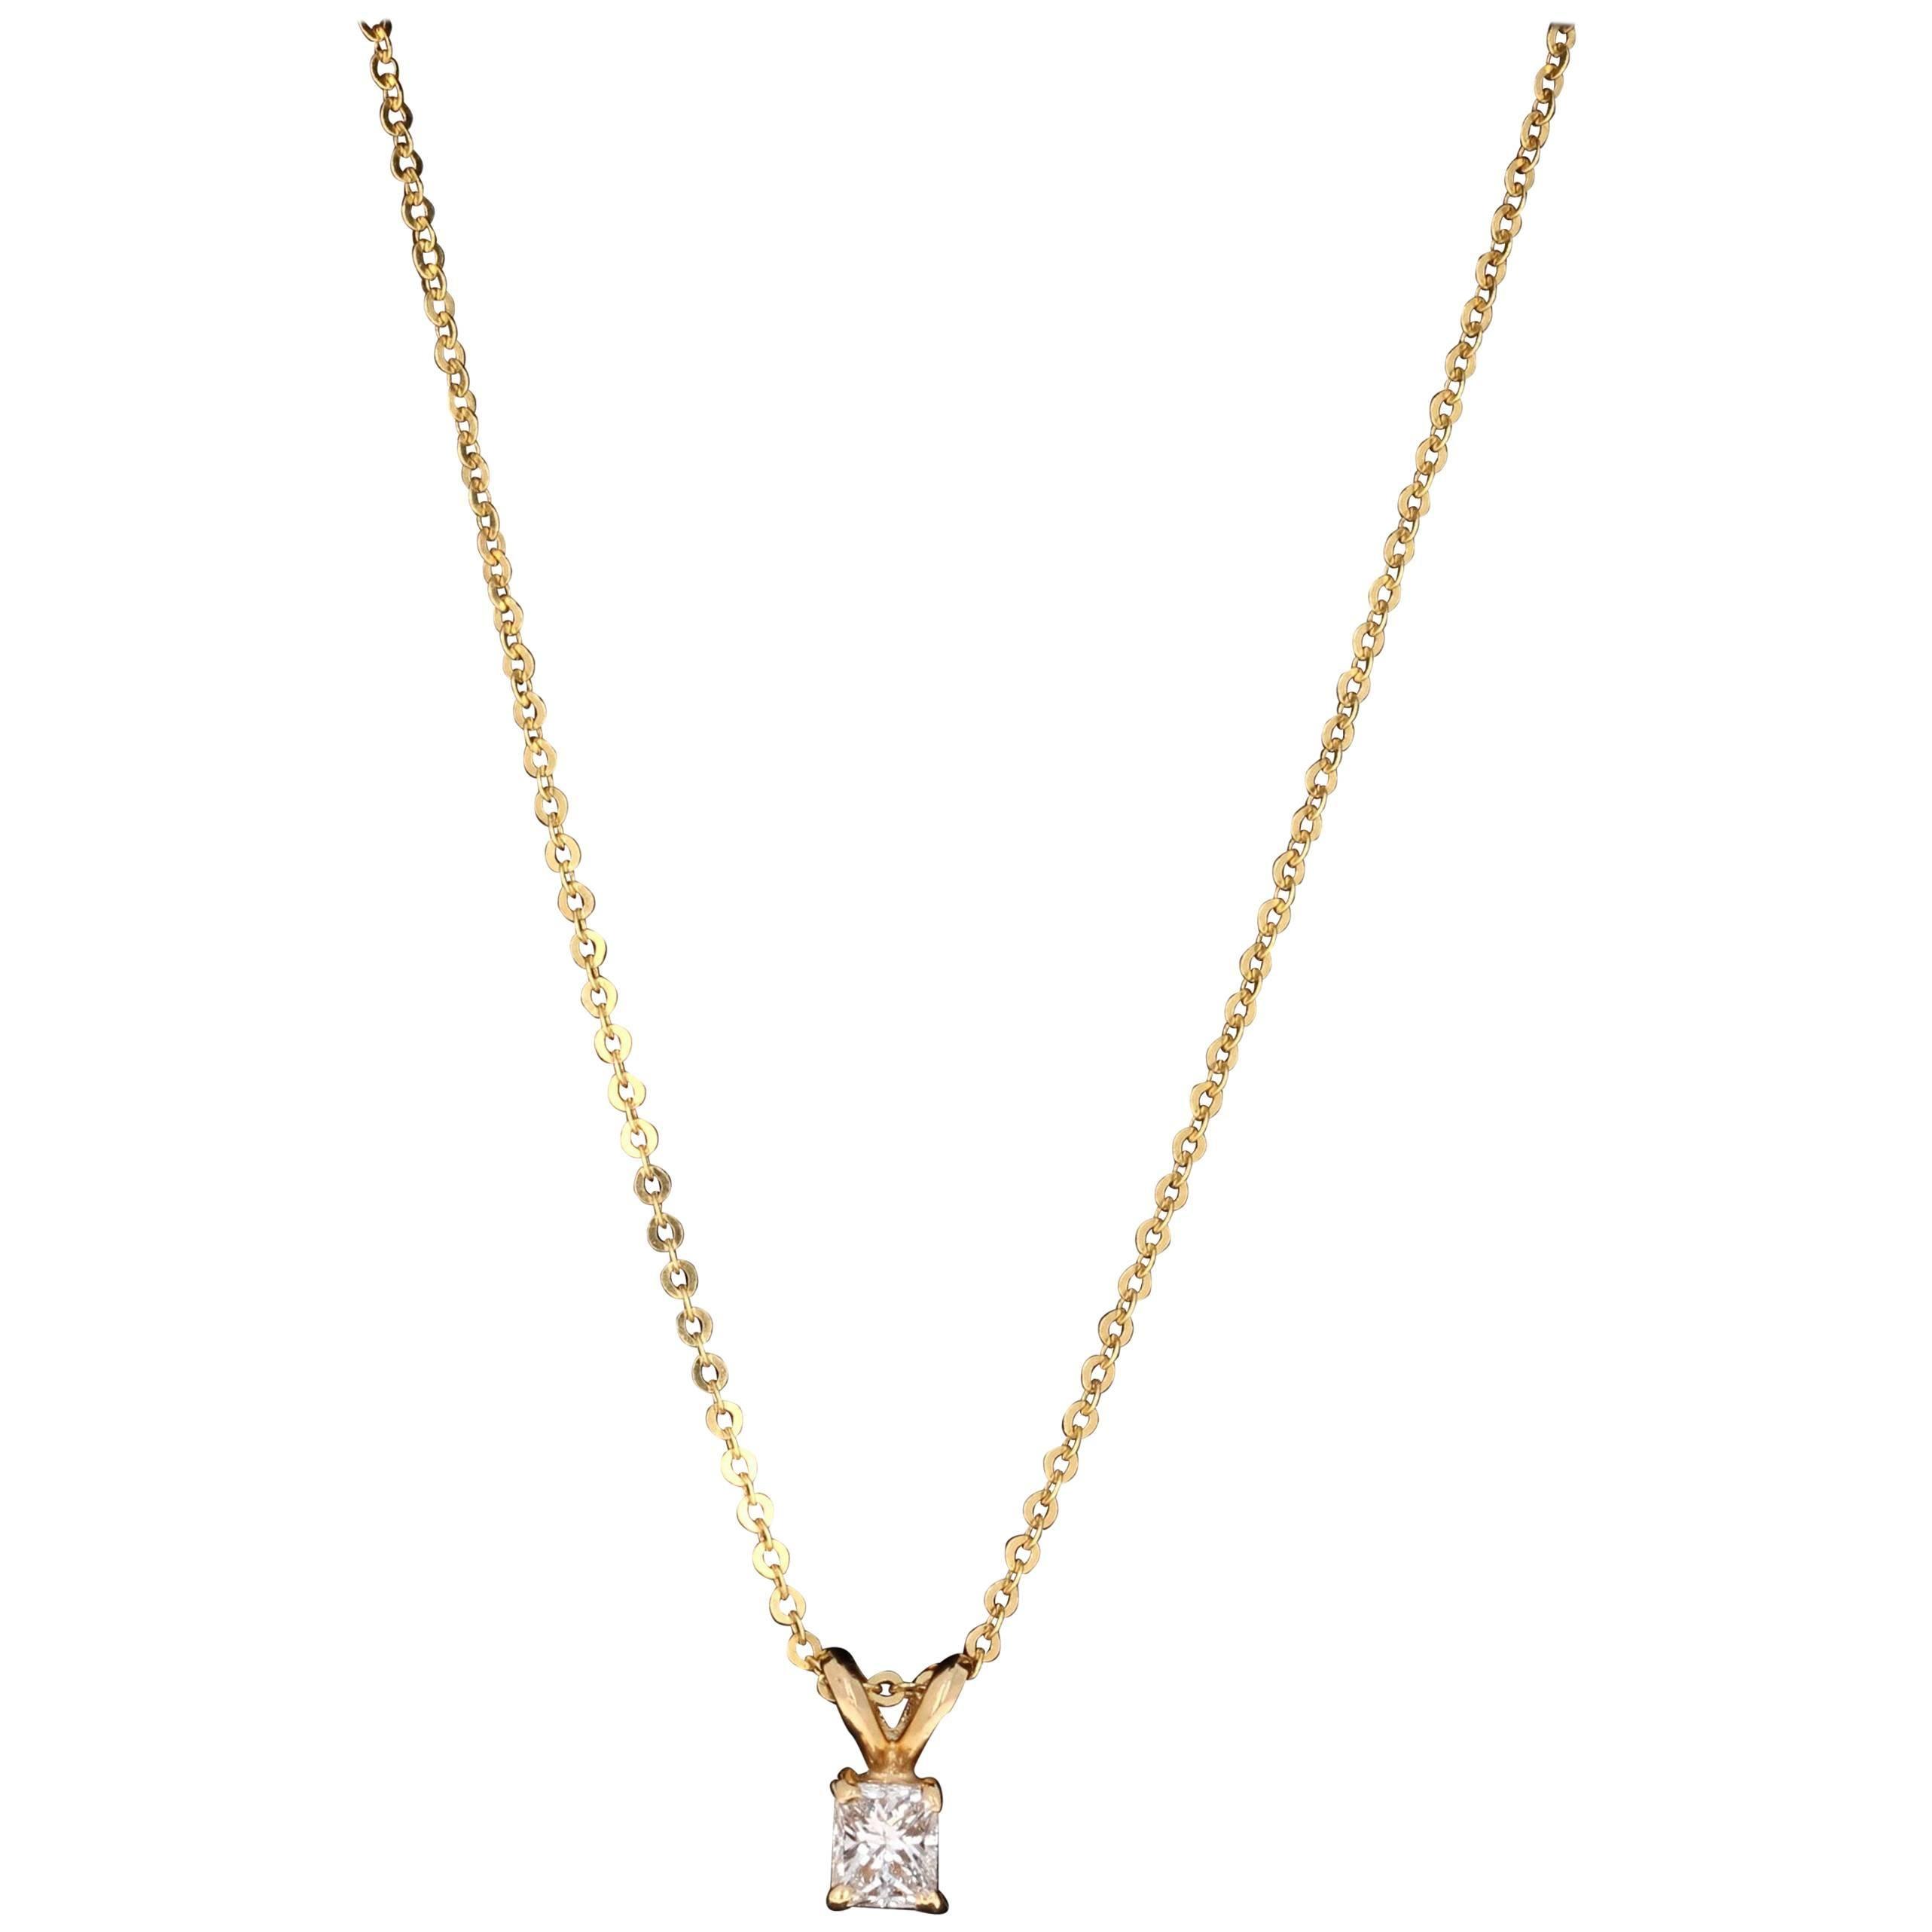 0.26 Carat Princess Cut Diamond Yellow Gold Chain Necklace